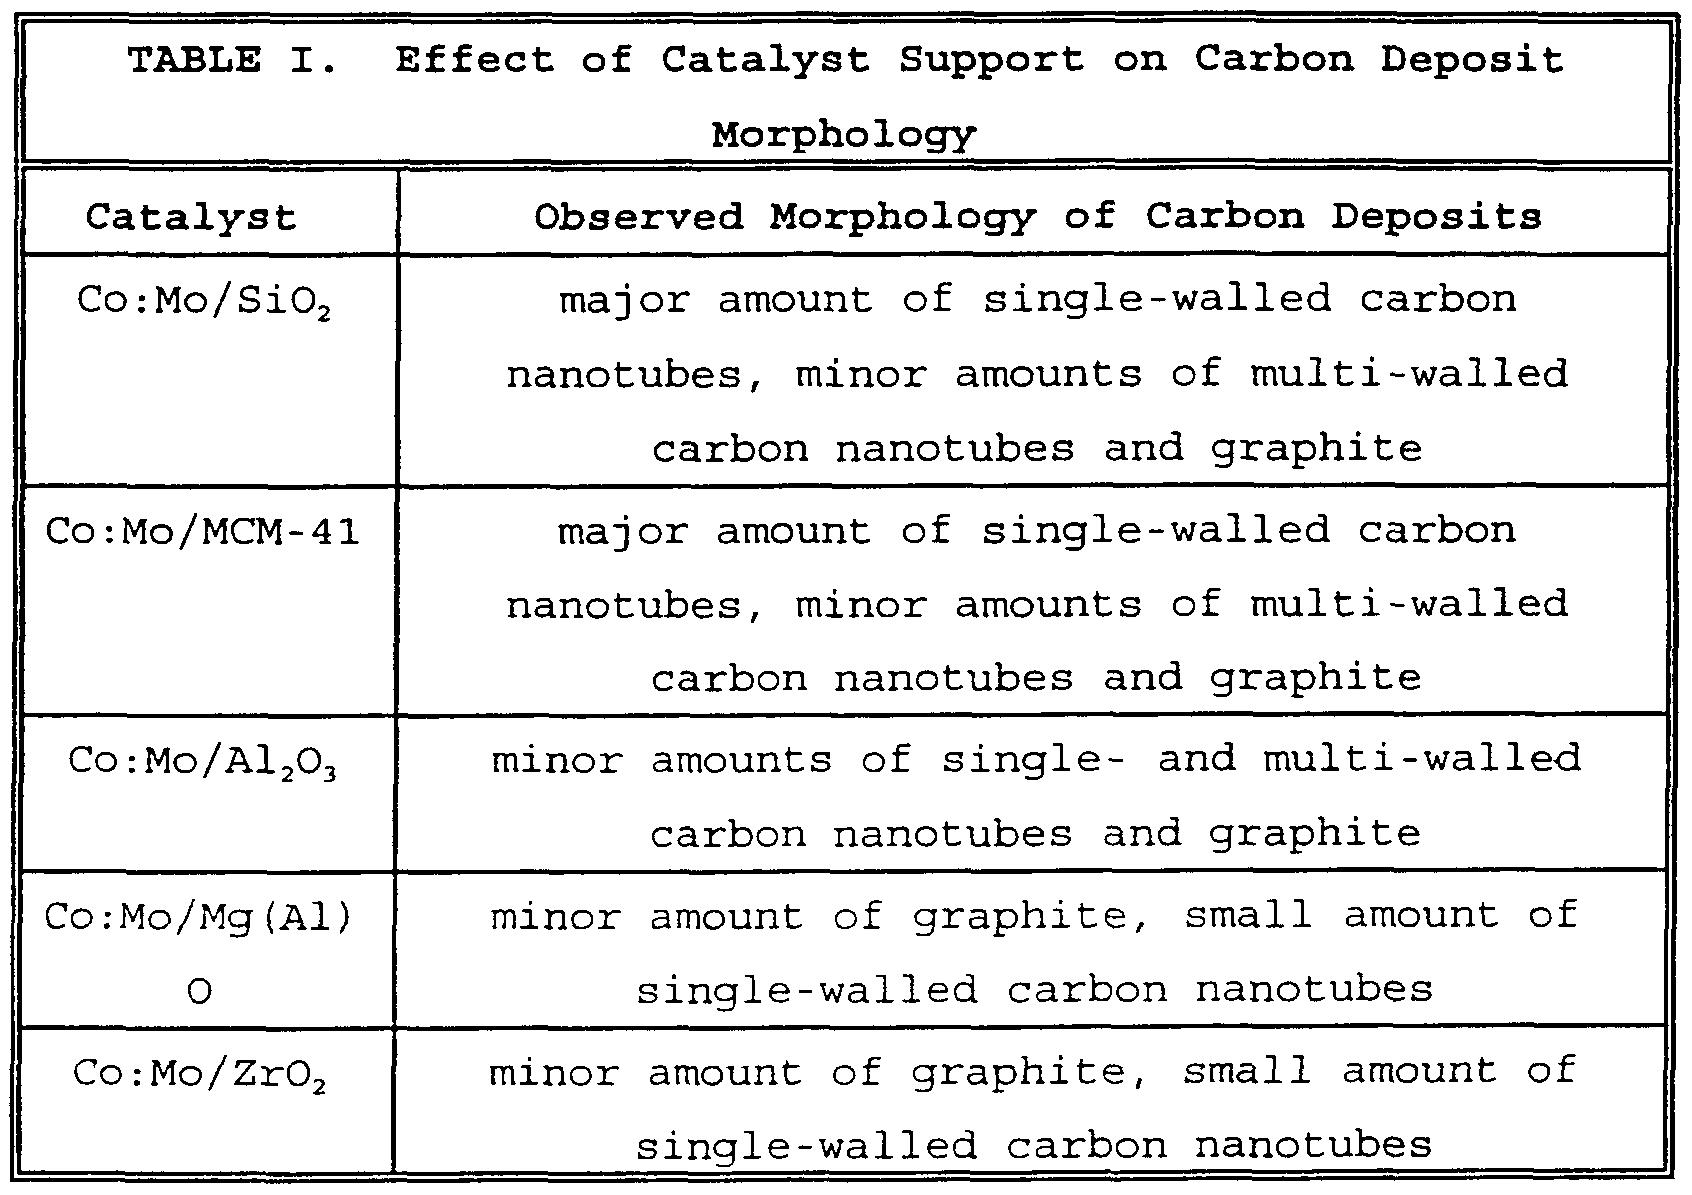 deposition summary template microsoft word www